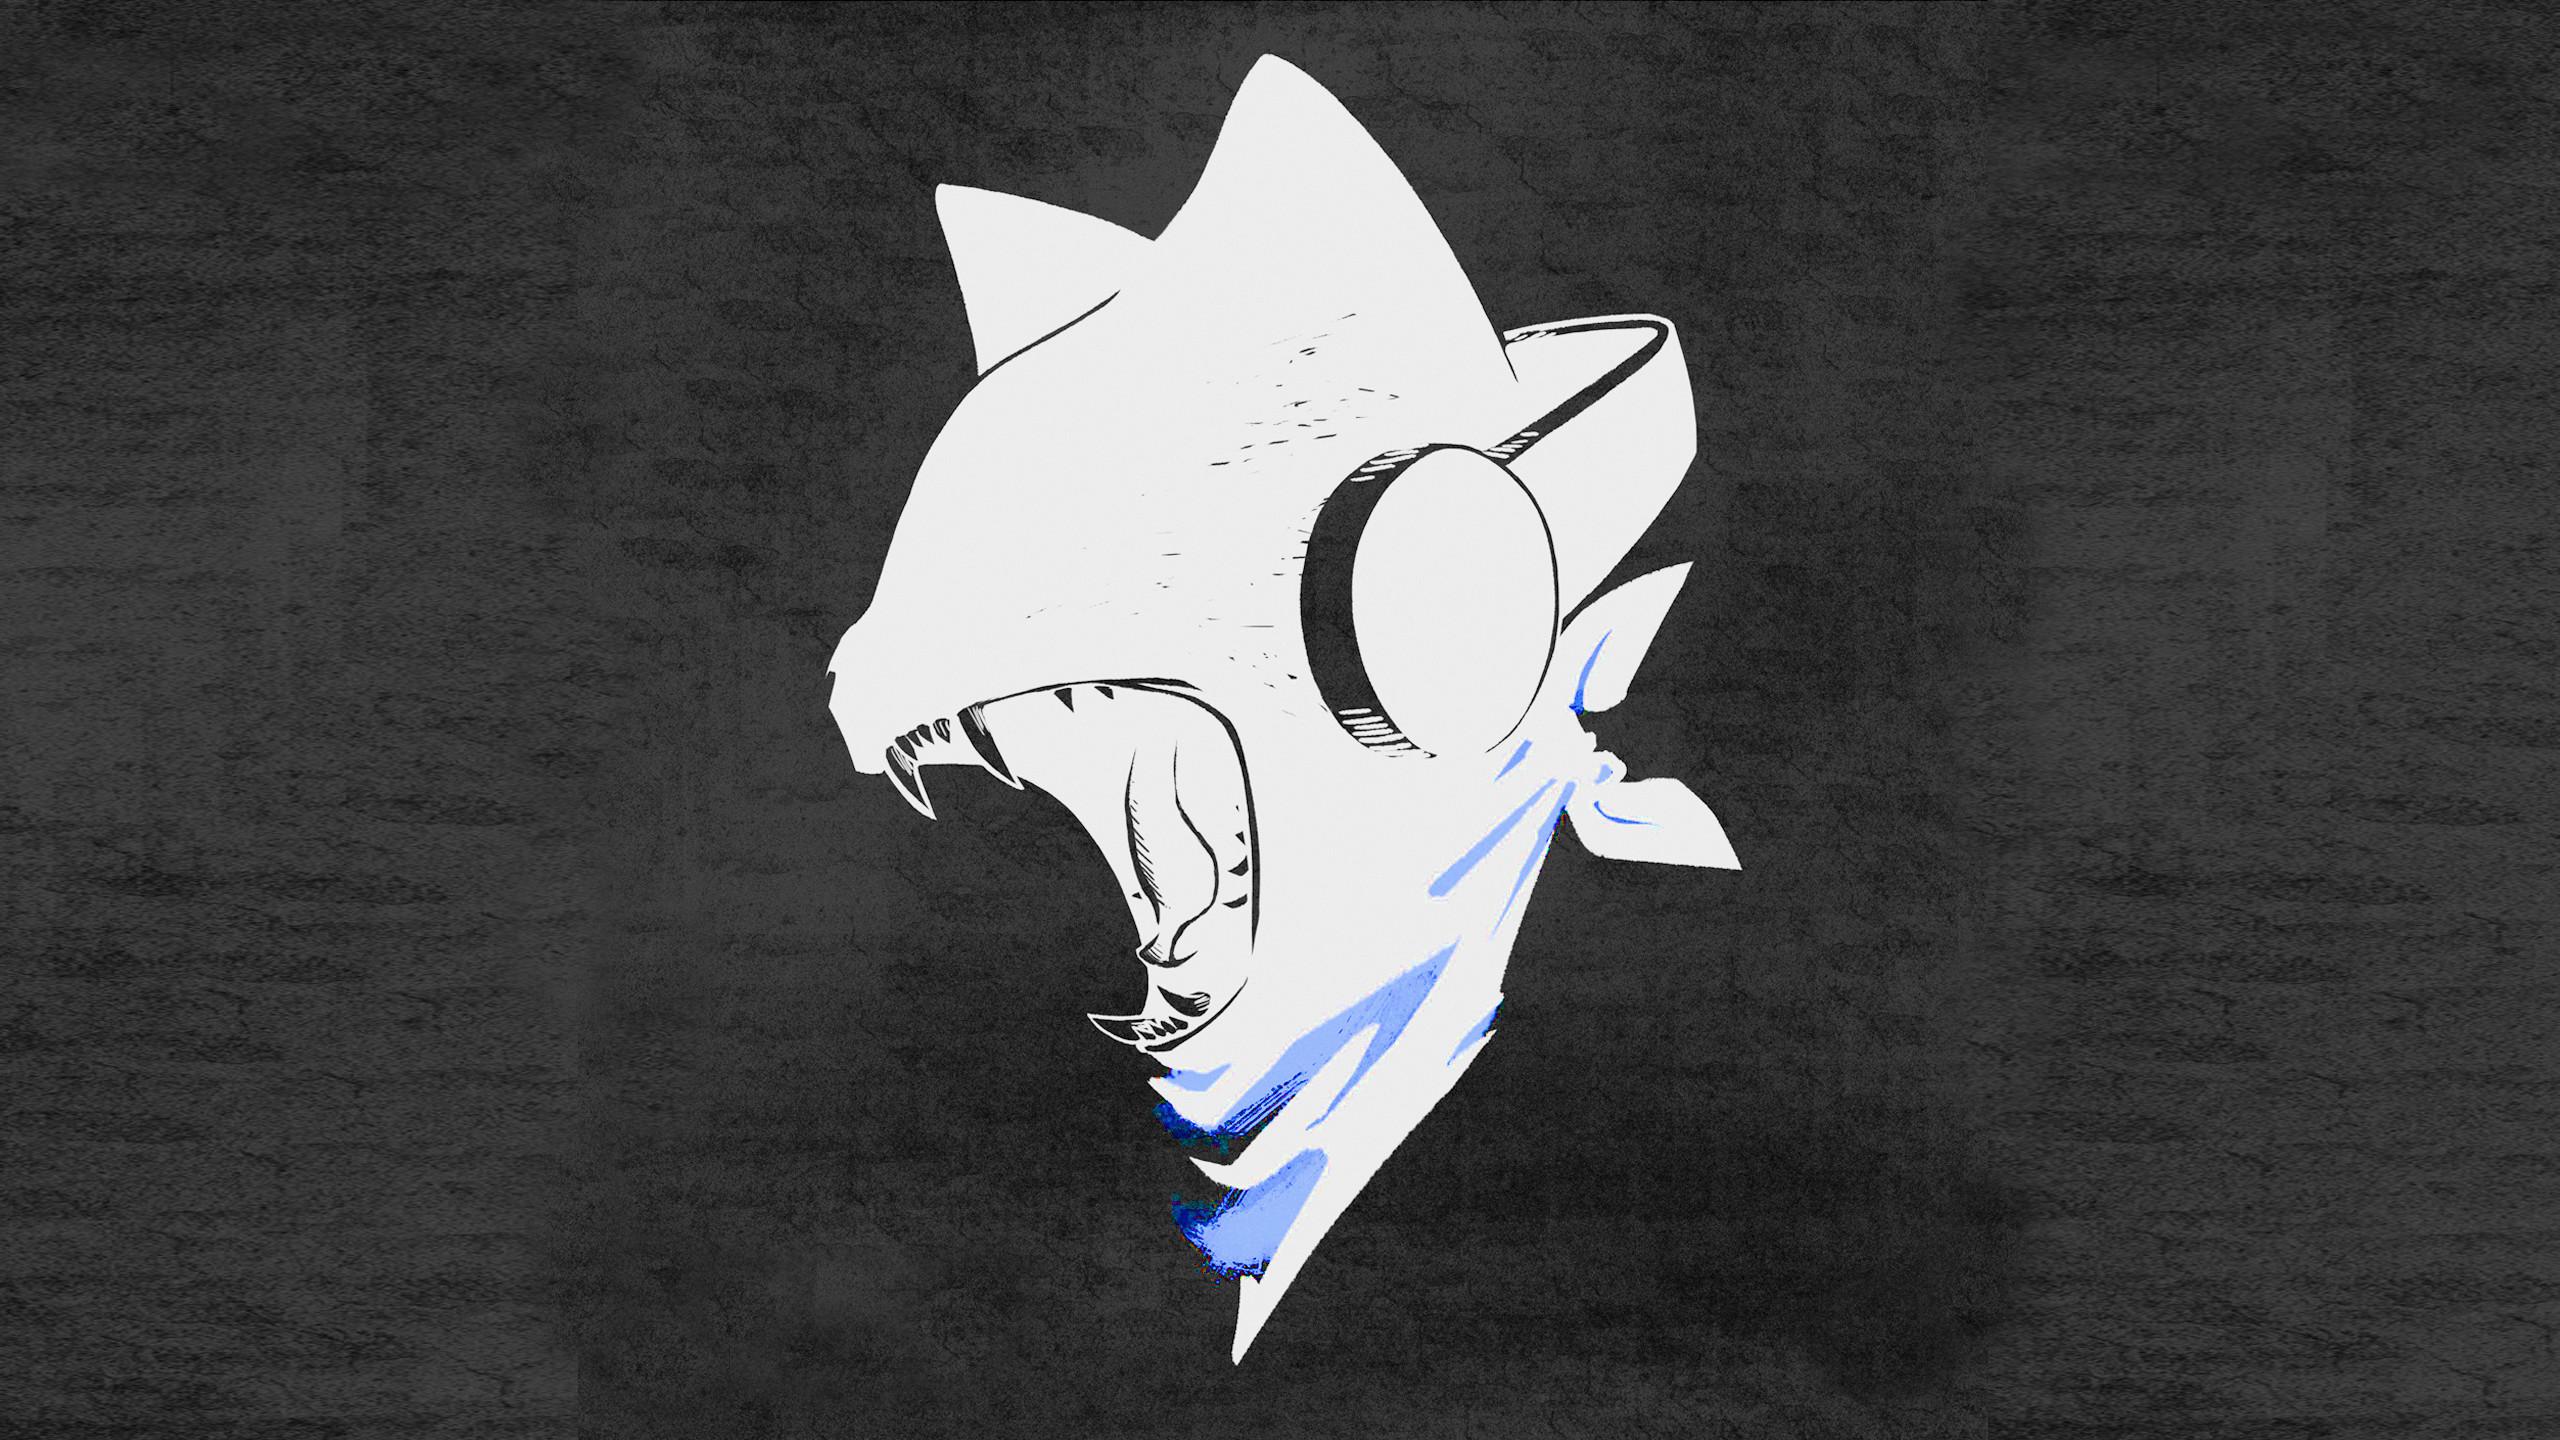 Monstercat Uncaged: White on Black Coloured Wallpapers (PC/Mac/Mobile)